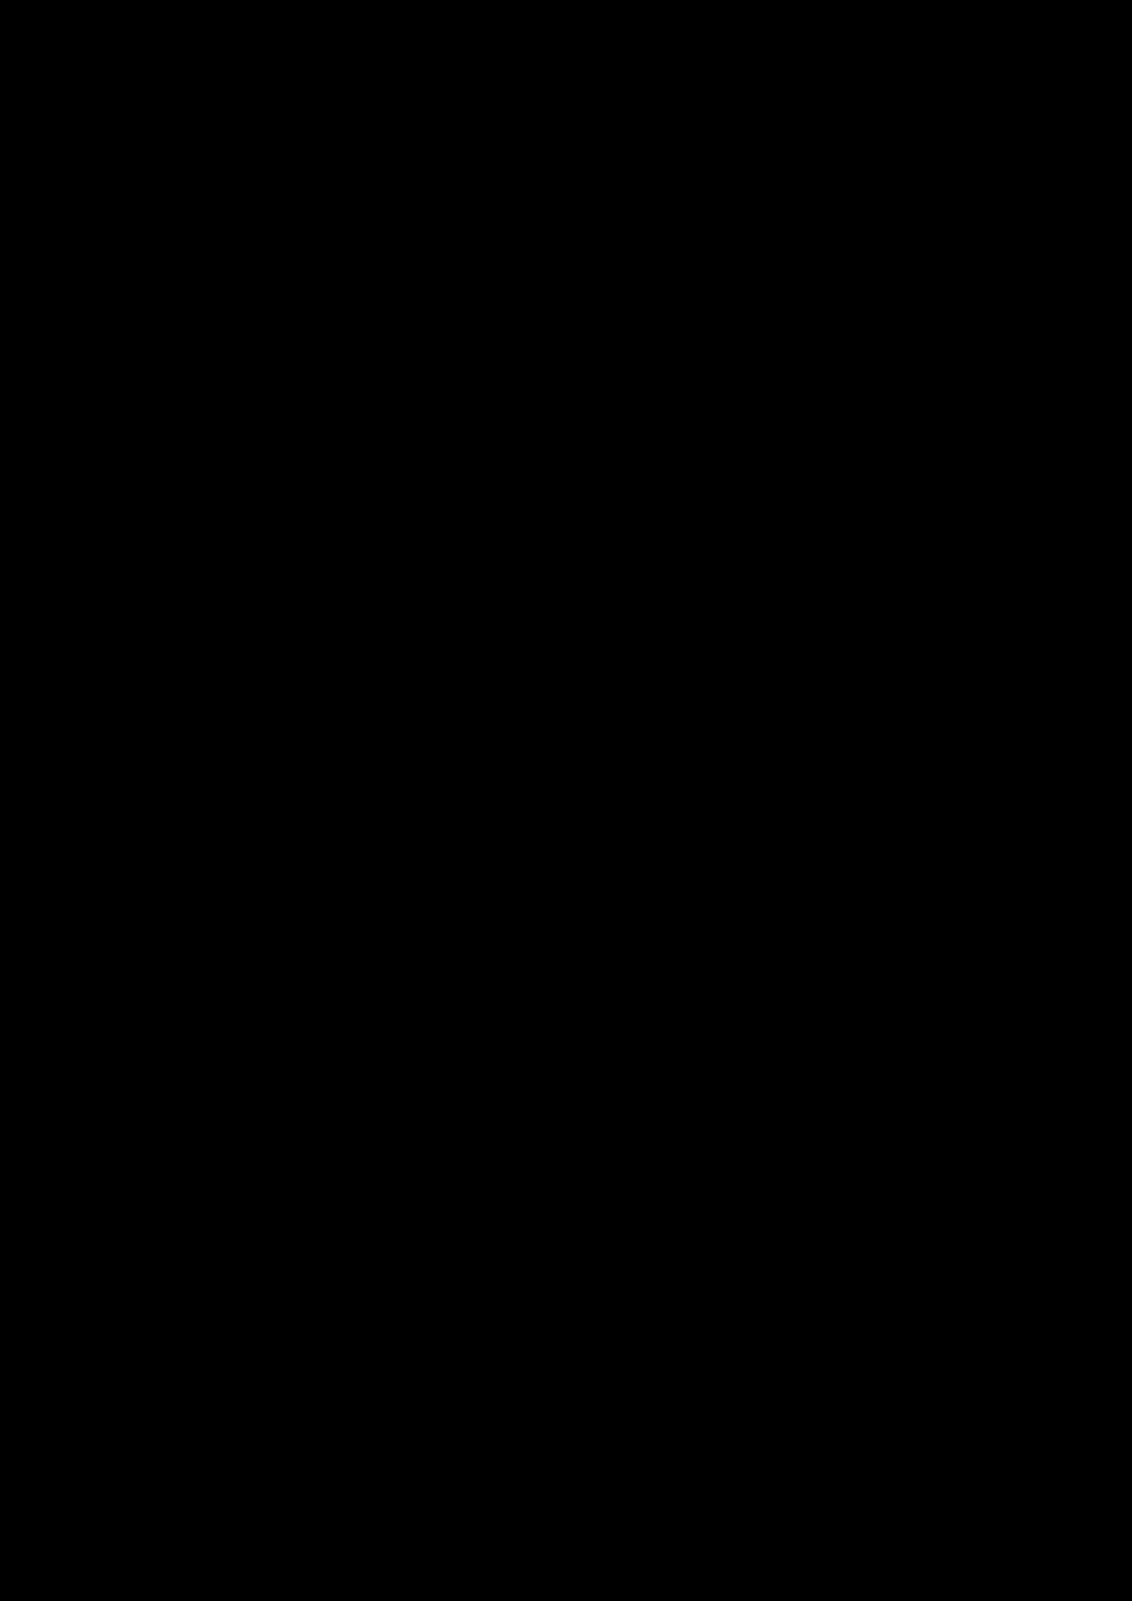 Mrs. Vandebilt slide, Image 17